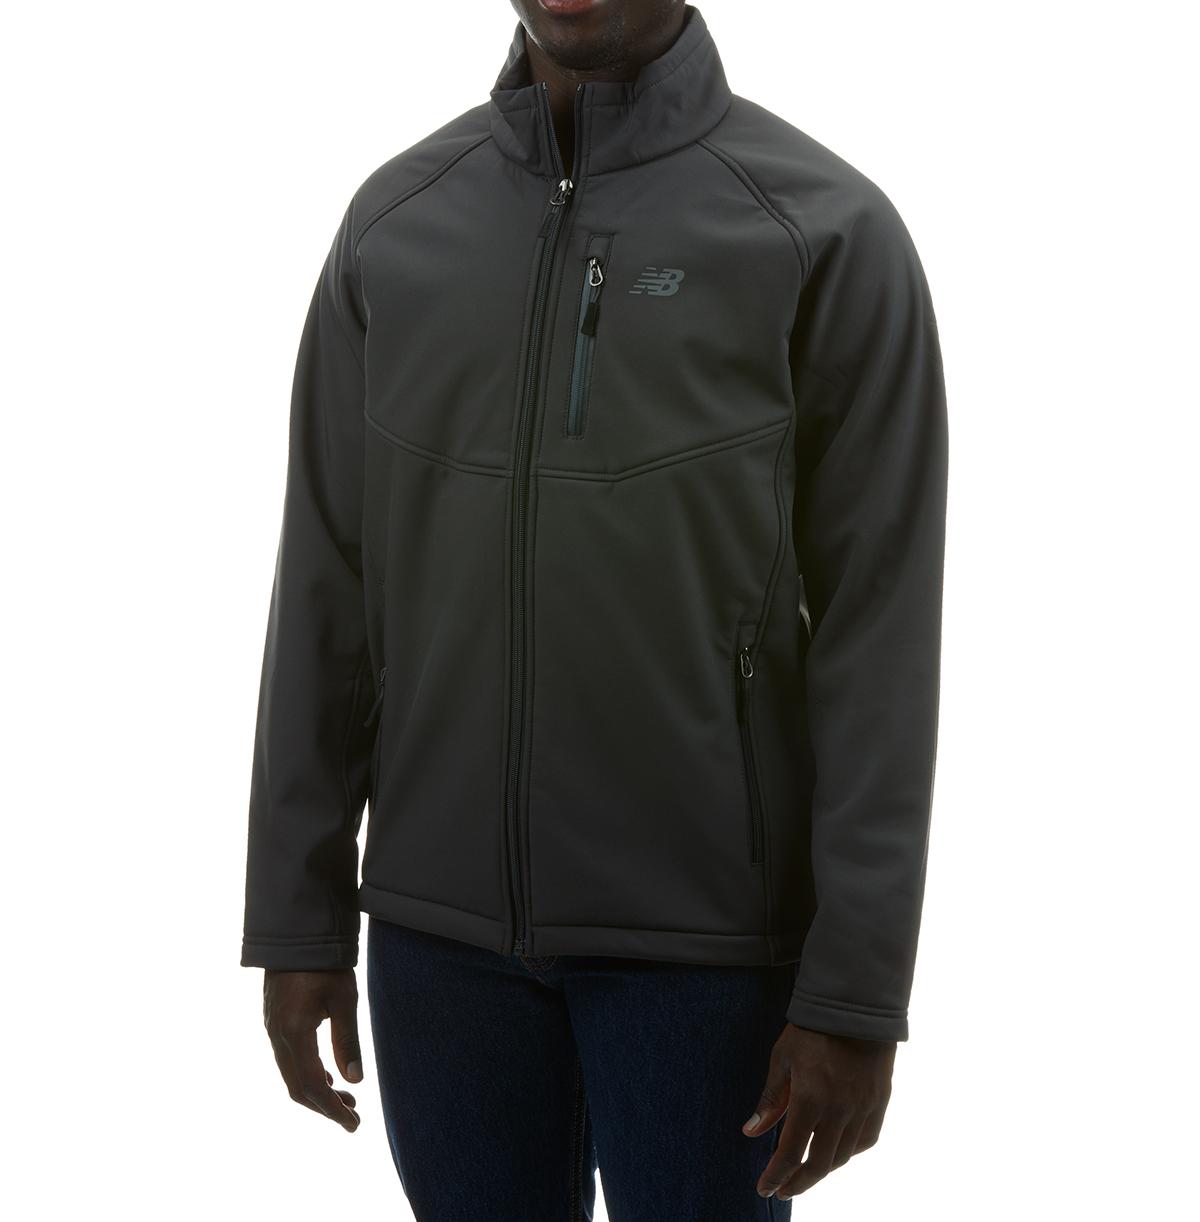 New Balance Men's Soft Shell Jacket With Sherpa Lining - Black, XXL